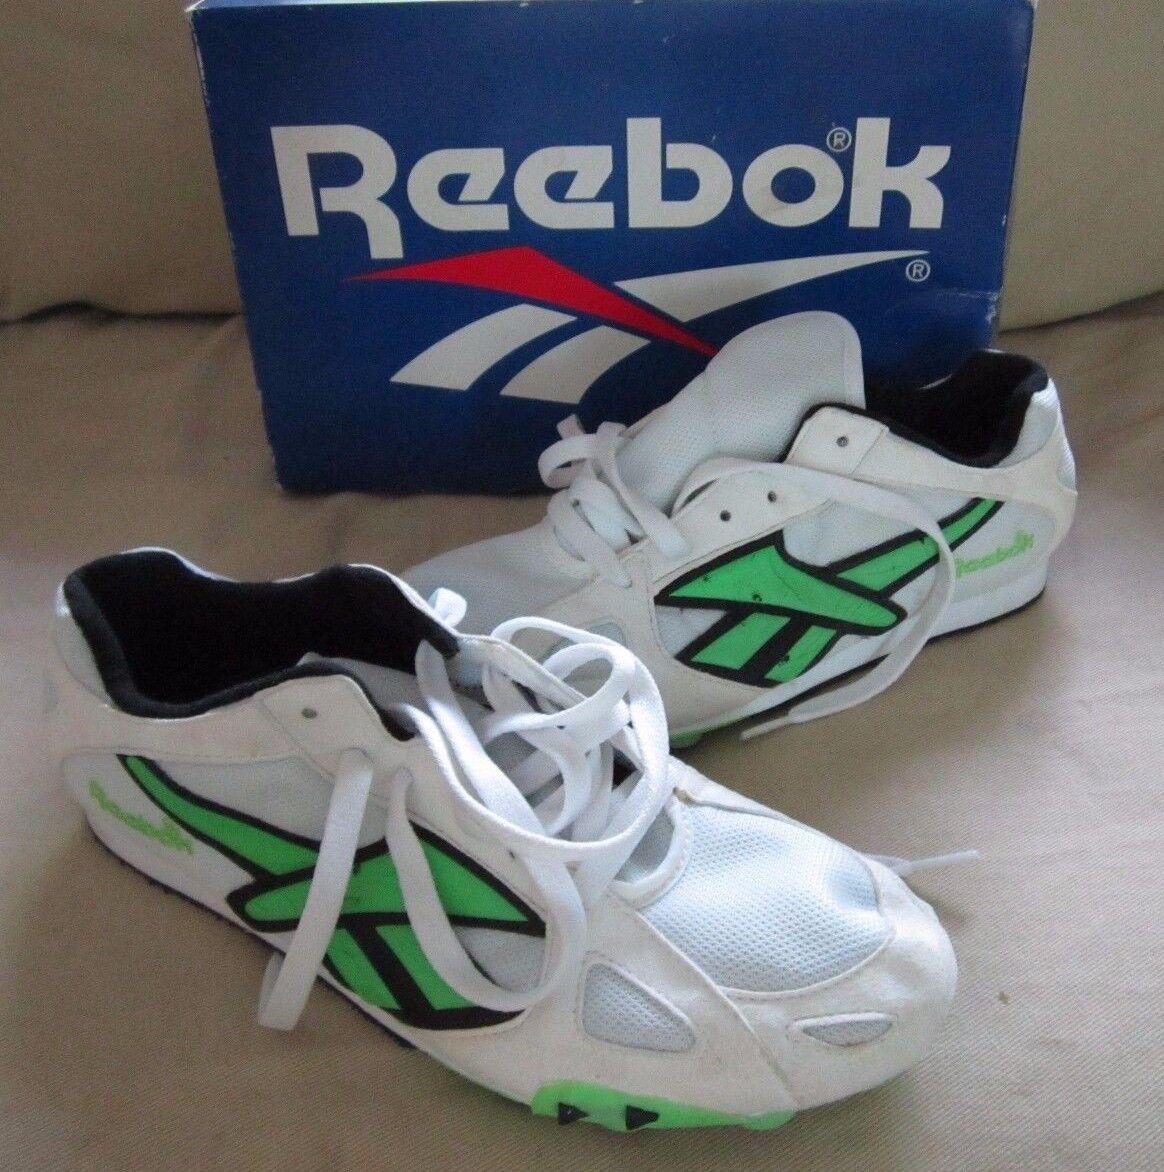 Floración de claridad  Vintage Reebok Running Track & Field Athletics Distance Spikes Shoes M 8 W  10 for sale online